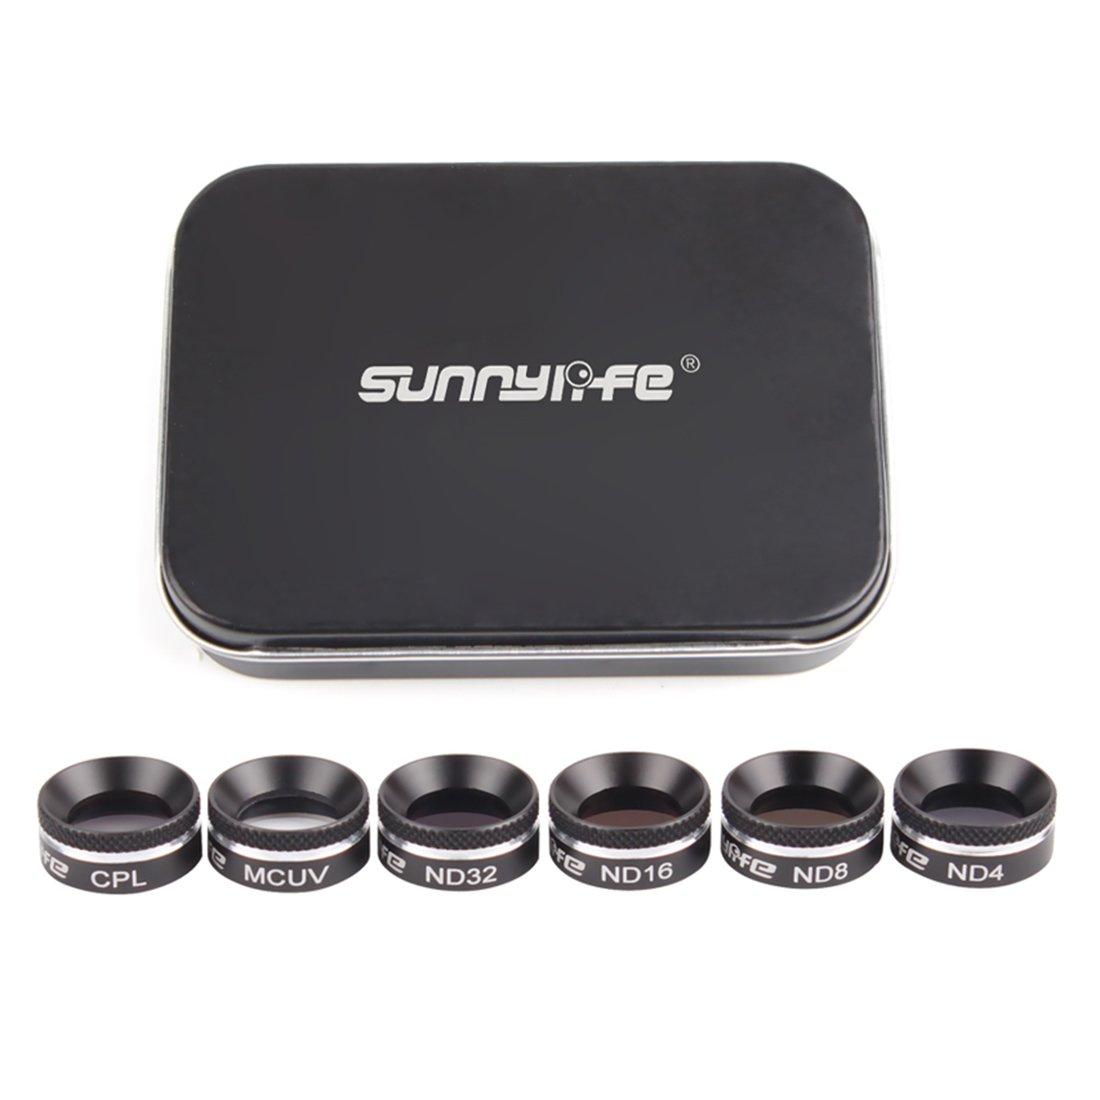 Foxom Sunnylife 6 Pezzi Filtri Lente Filtro Kit per DJI Mavic Air - MCUV CPL ND4 ND8 ND16 ND32